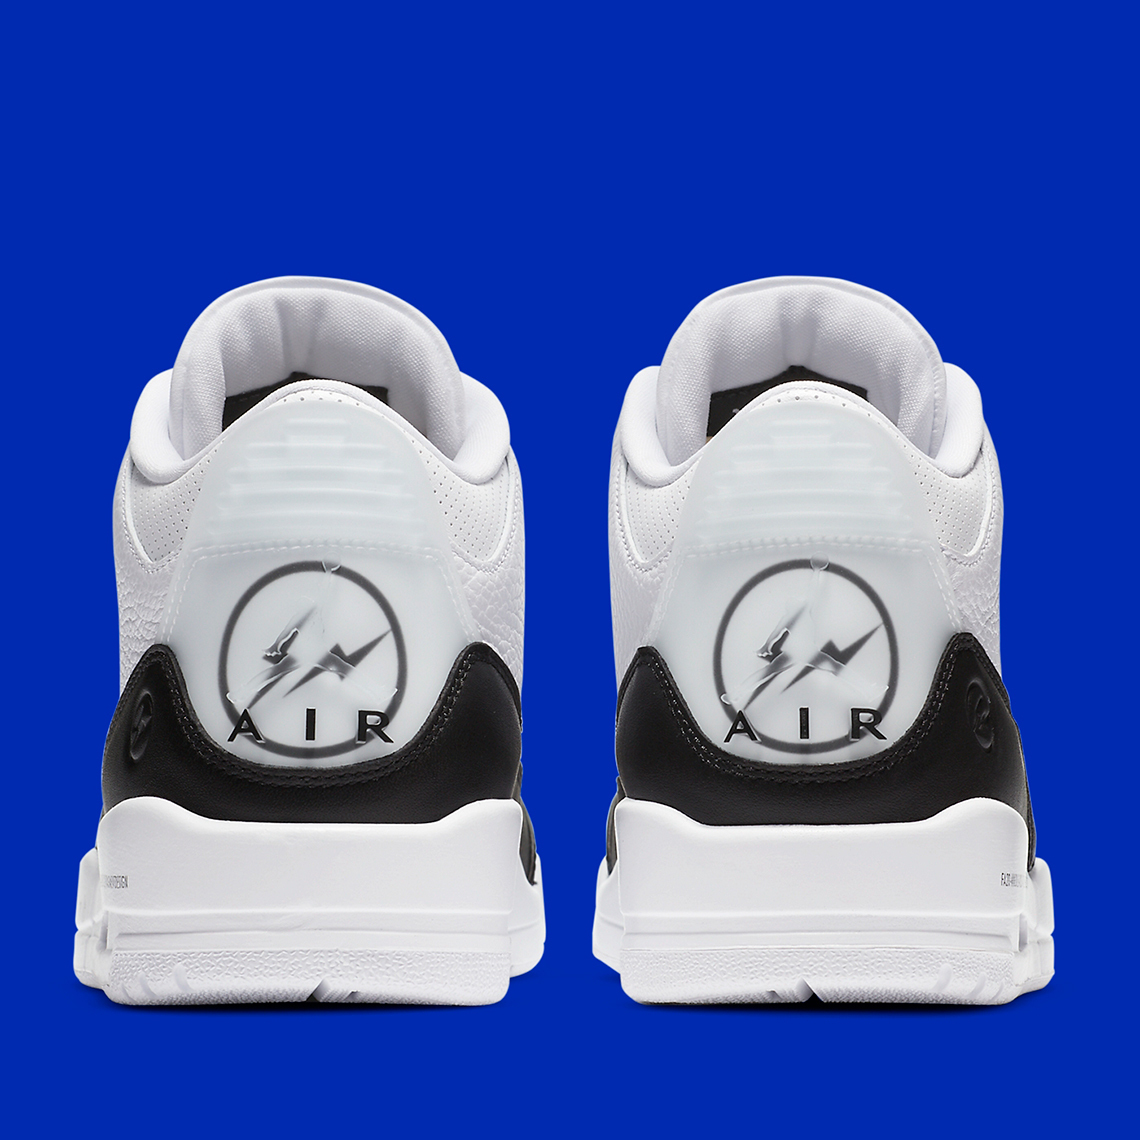 giày thể thao (14-20.9.2020) -Fragment Design x Air Jordan 3 Retro SP-elleman (8)